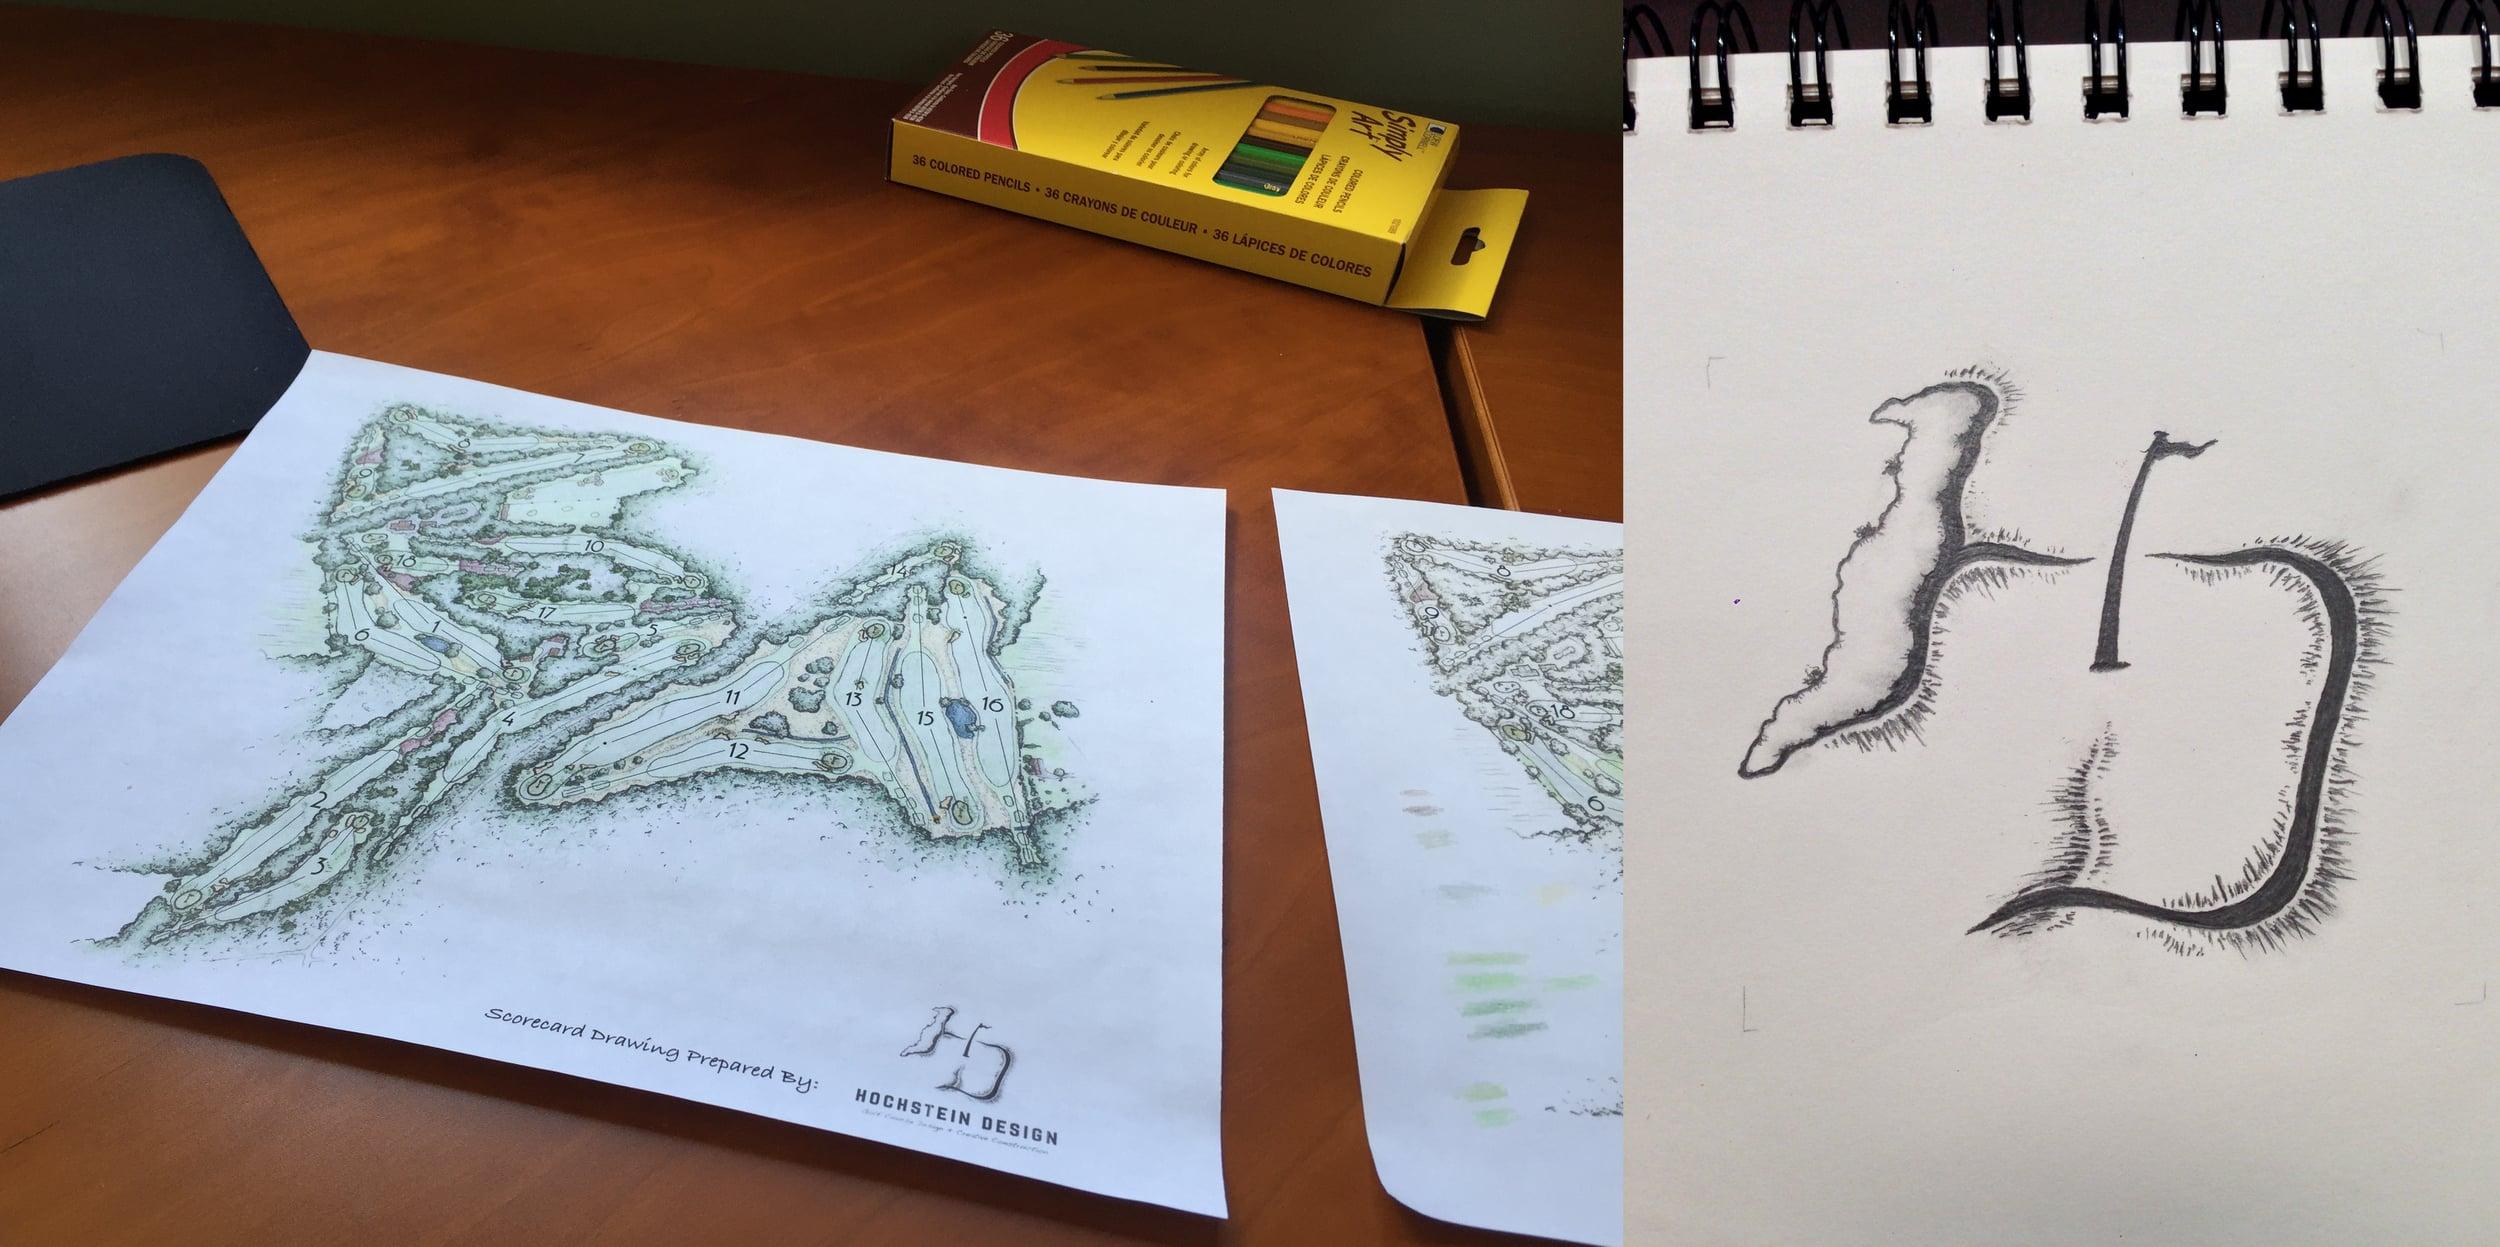 Sallandsche plan drawing and logo in progress